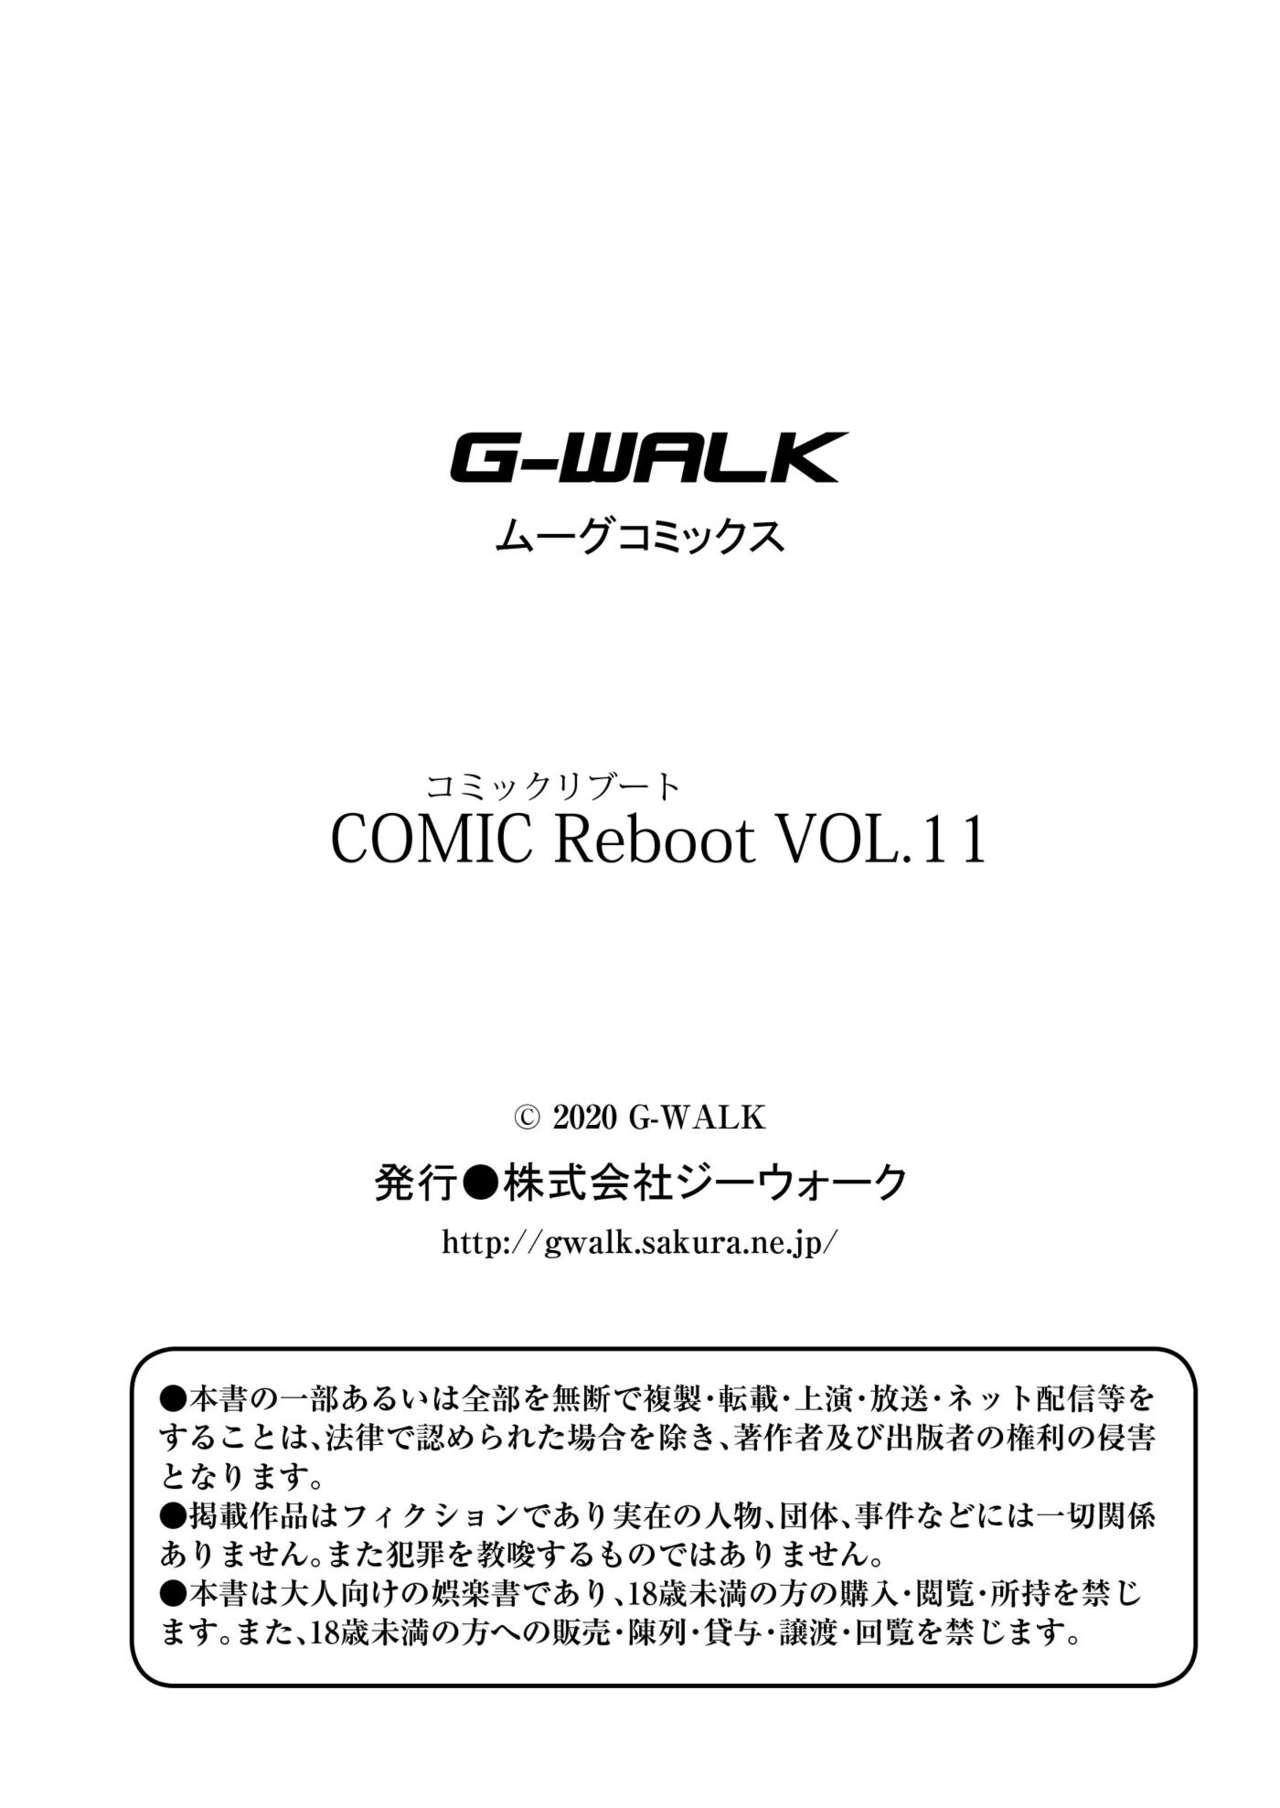 COMIC Reboot Vol. 11 522